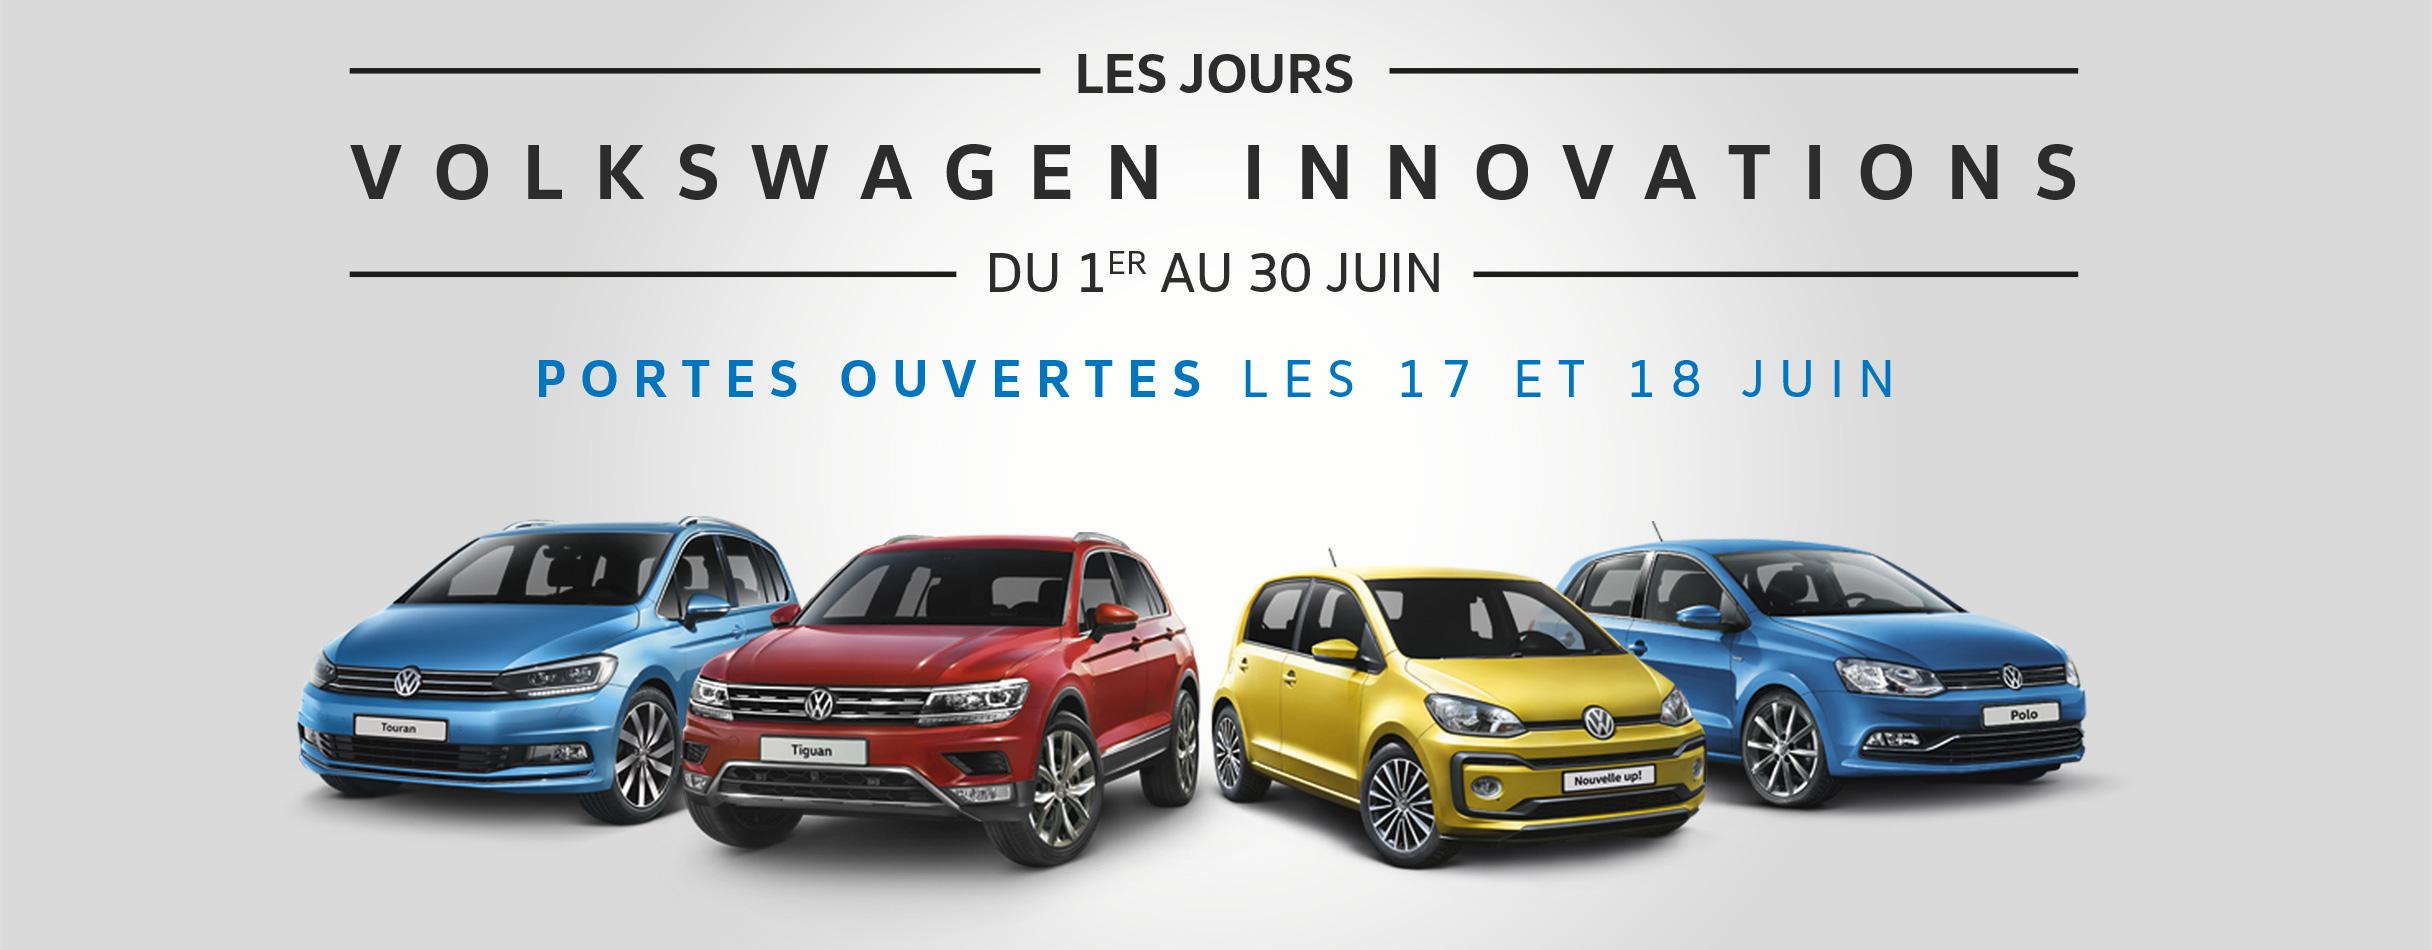 Les jours Volkswagen innovations